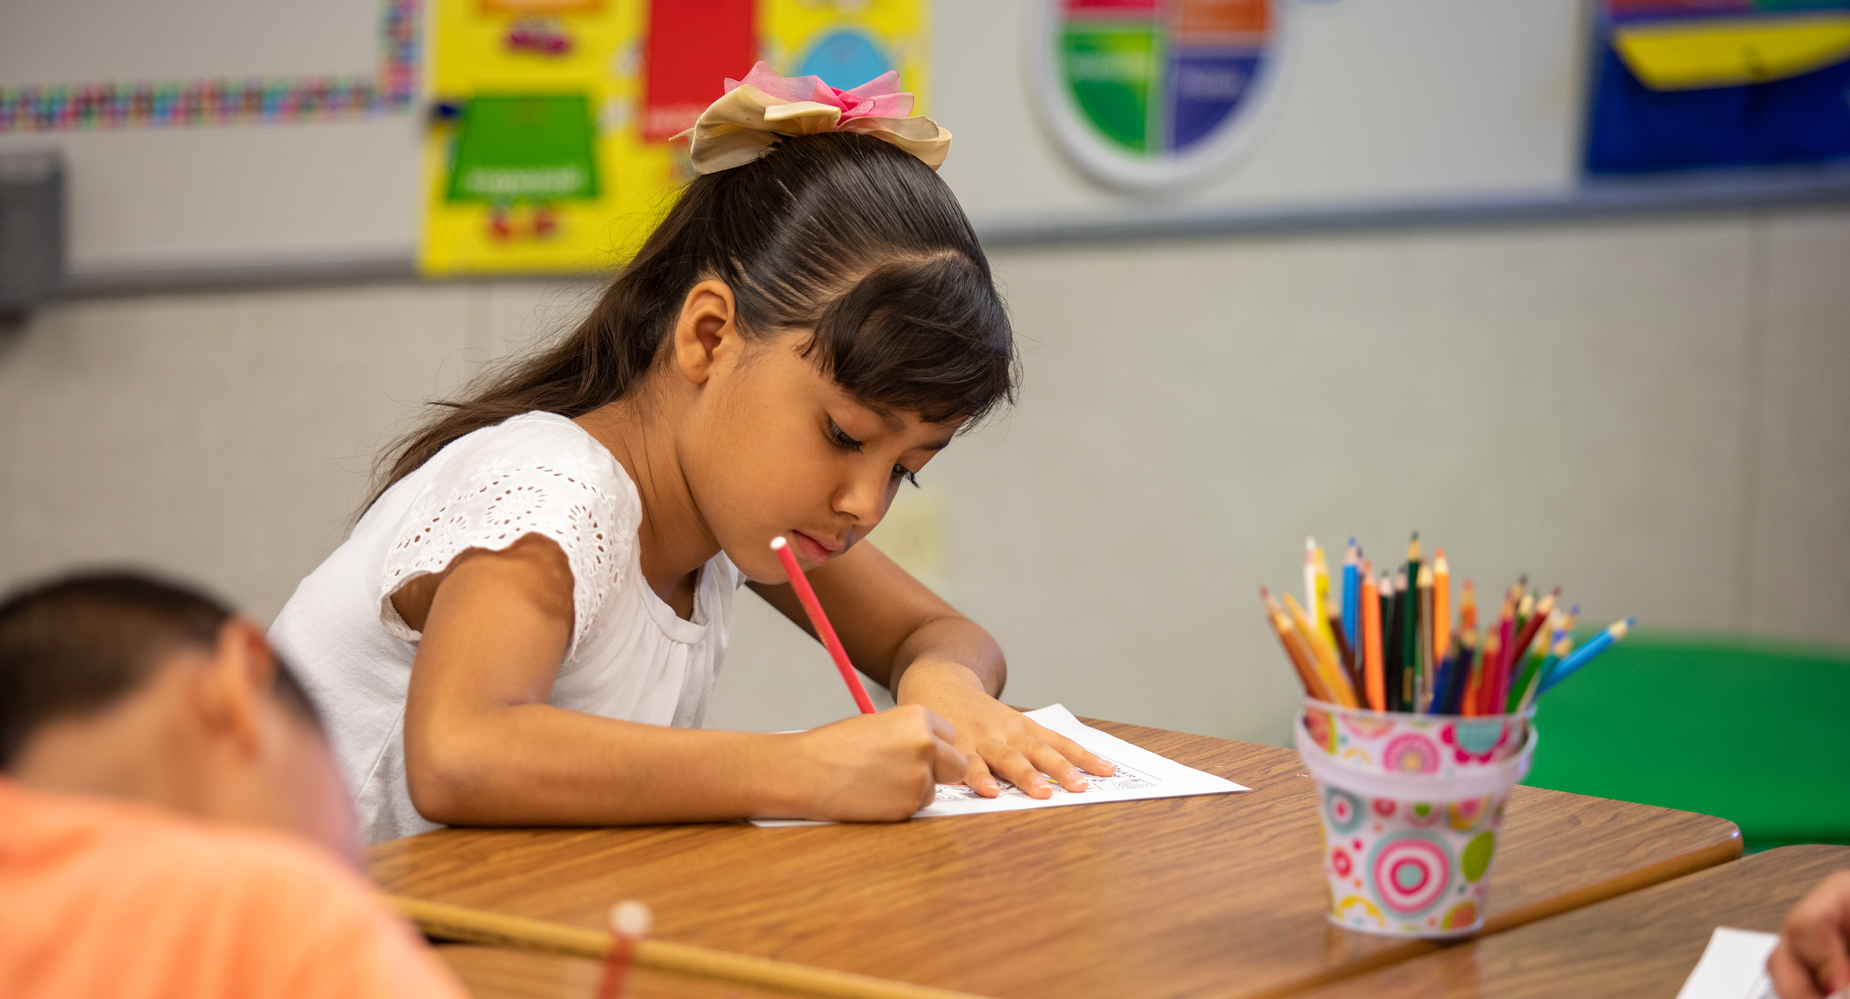 Girl at school desk coloring